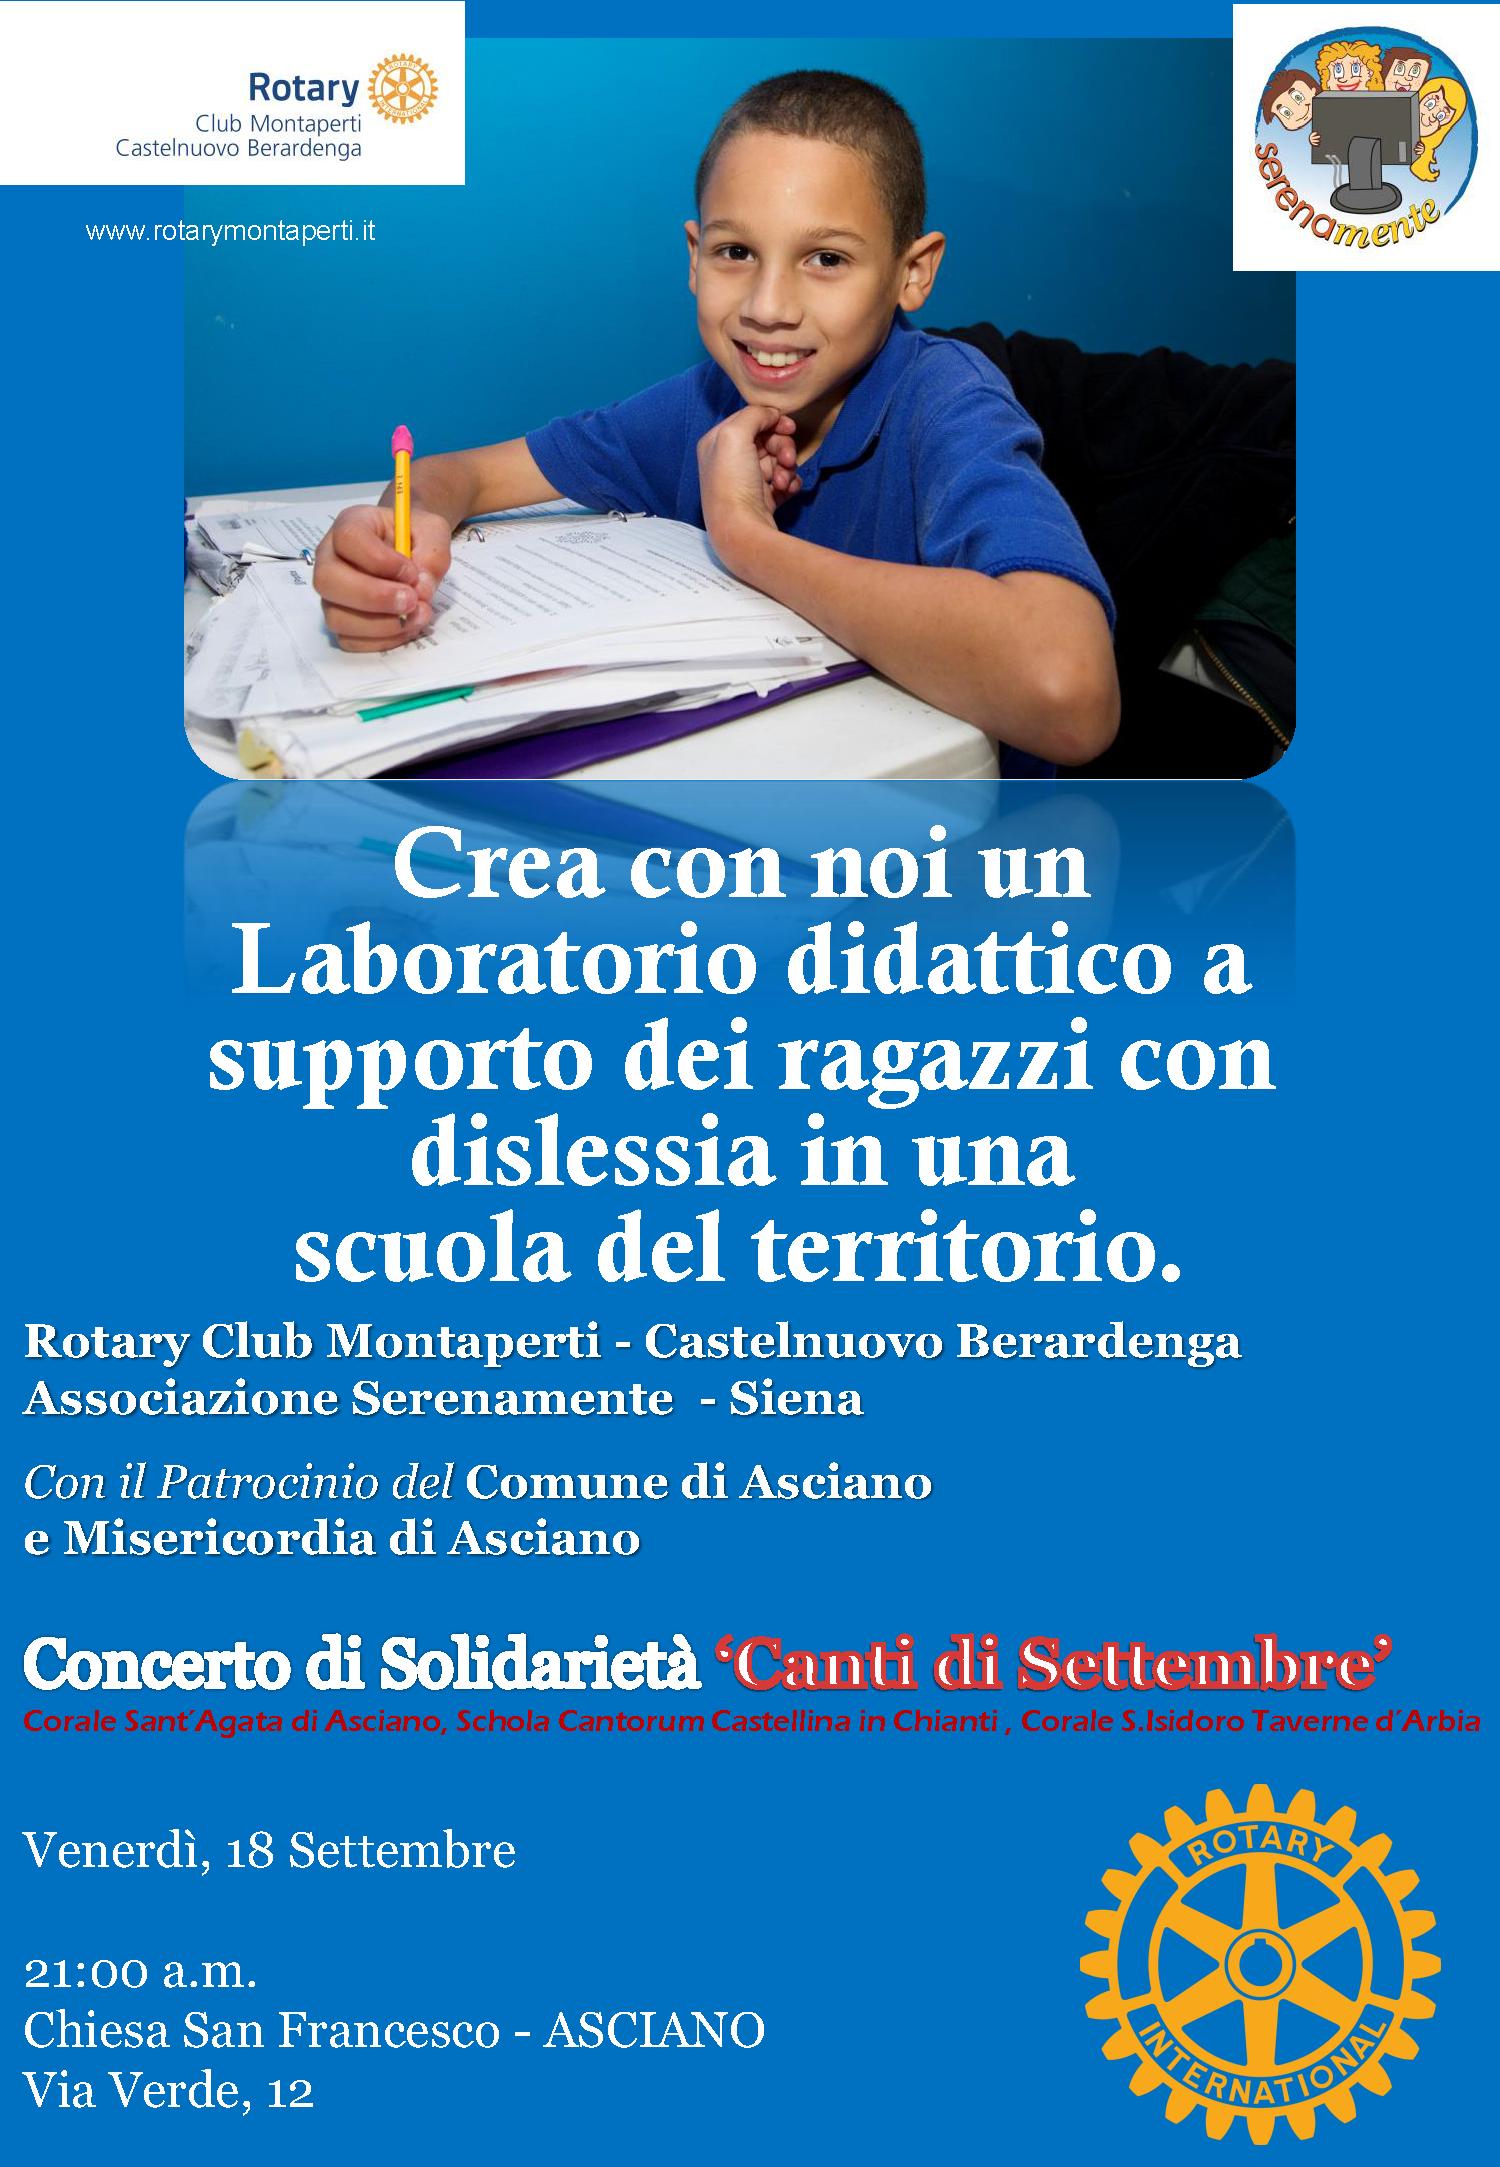 Poster_Concerto_Solidarietà